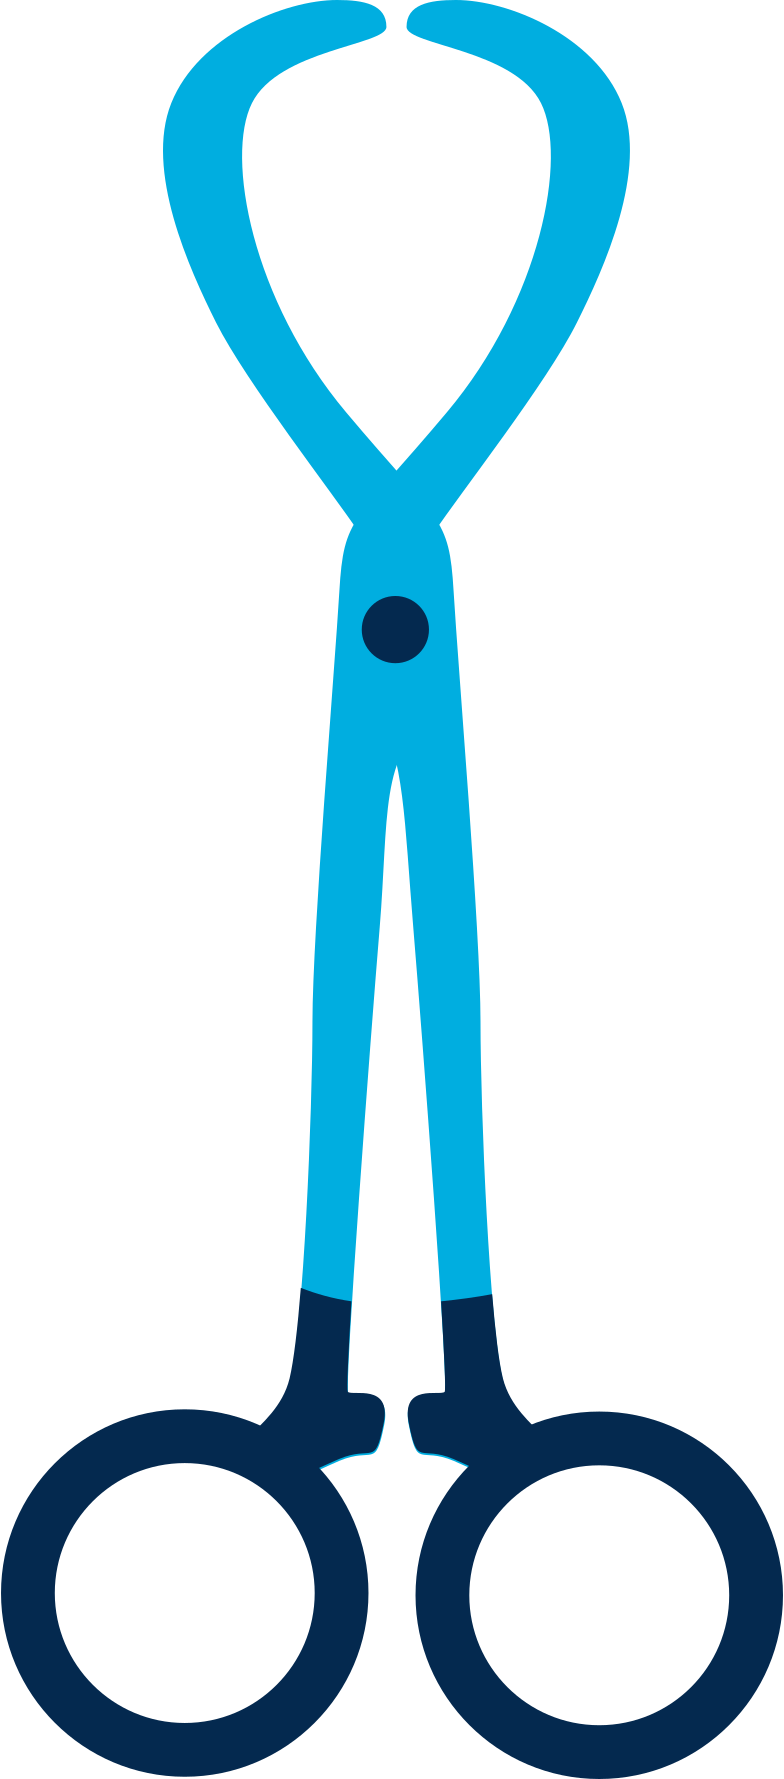 forceps Clipart illustration in PNG, SVG